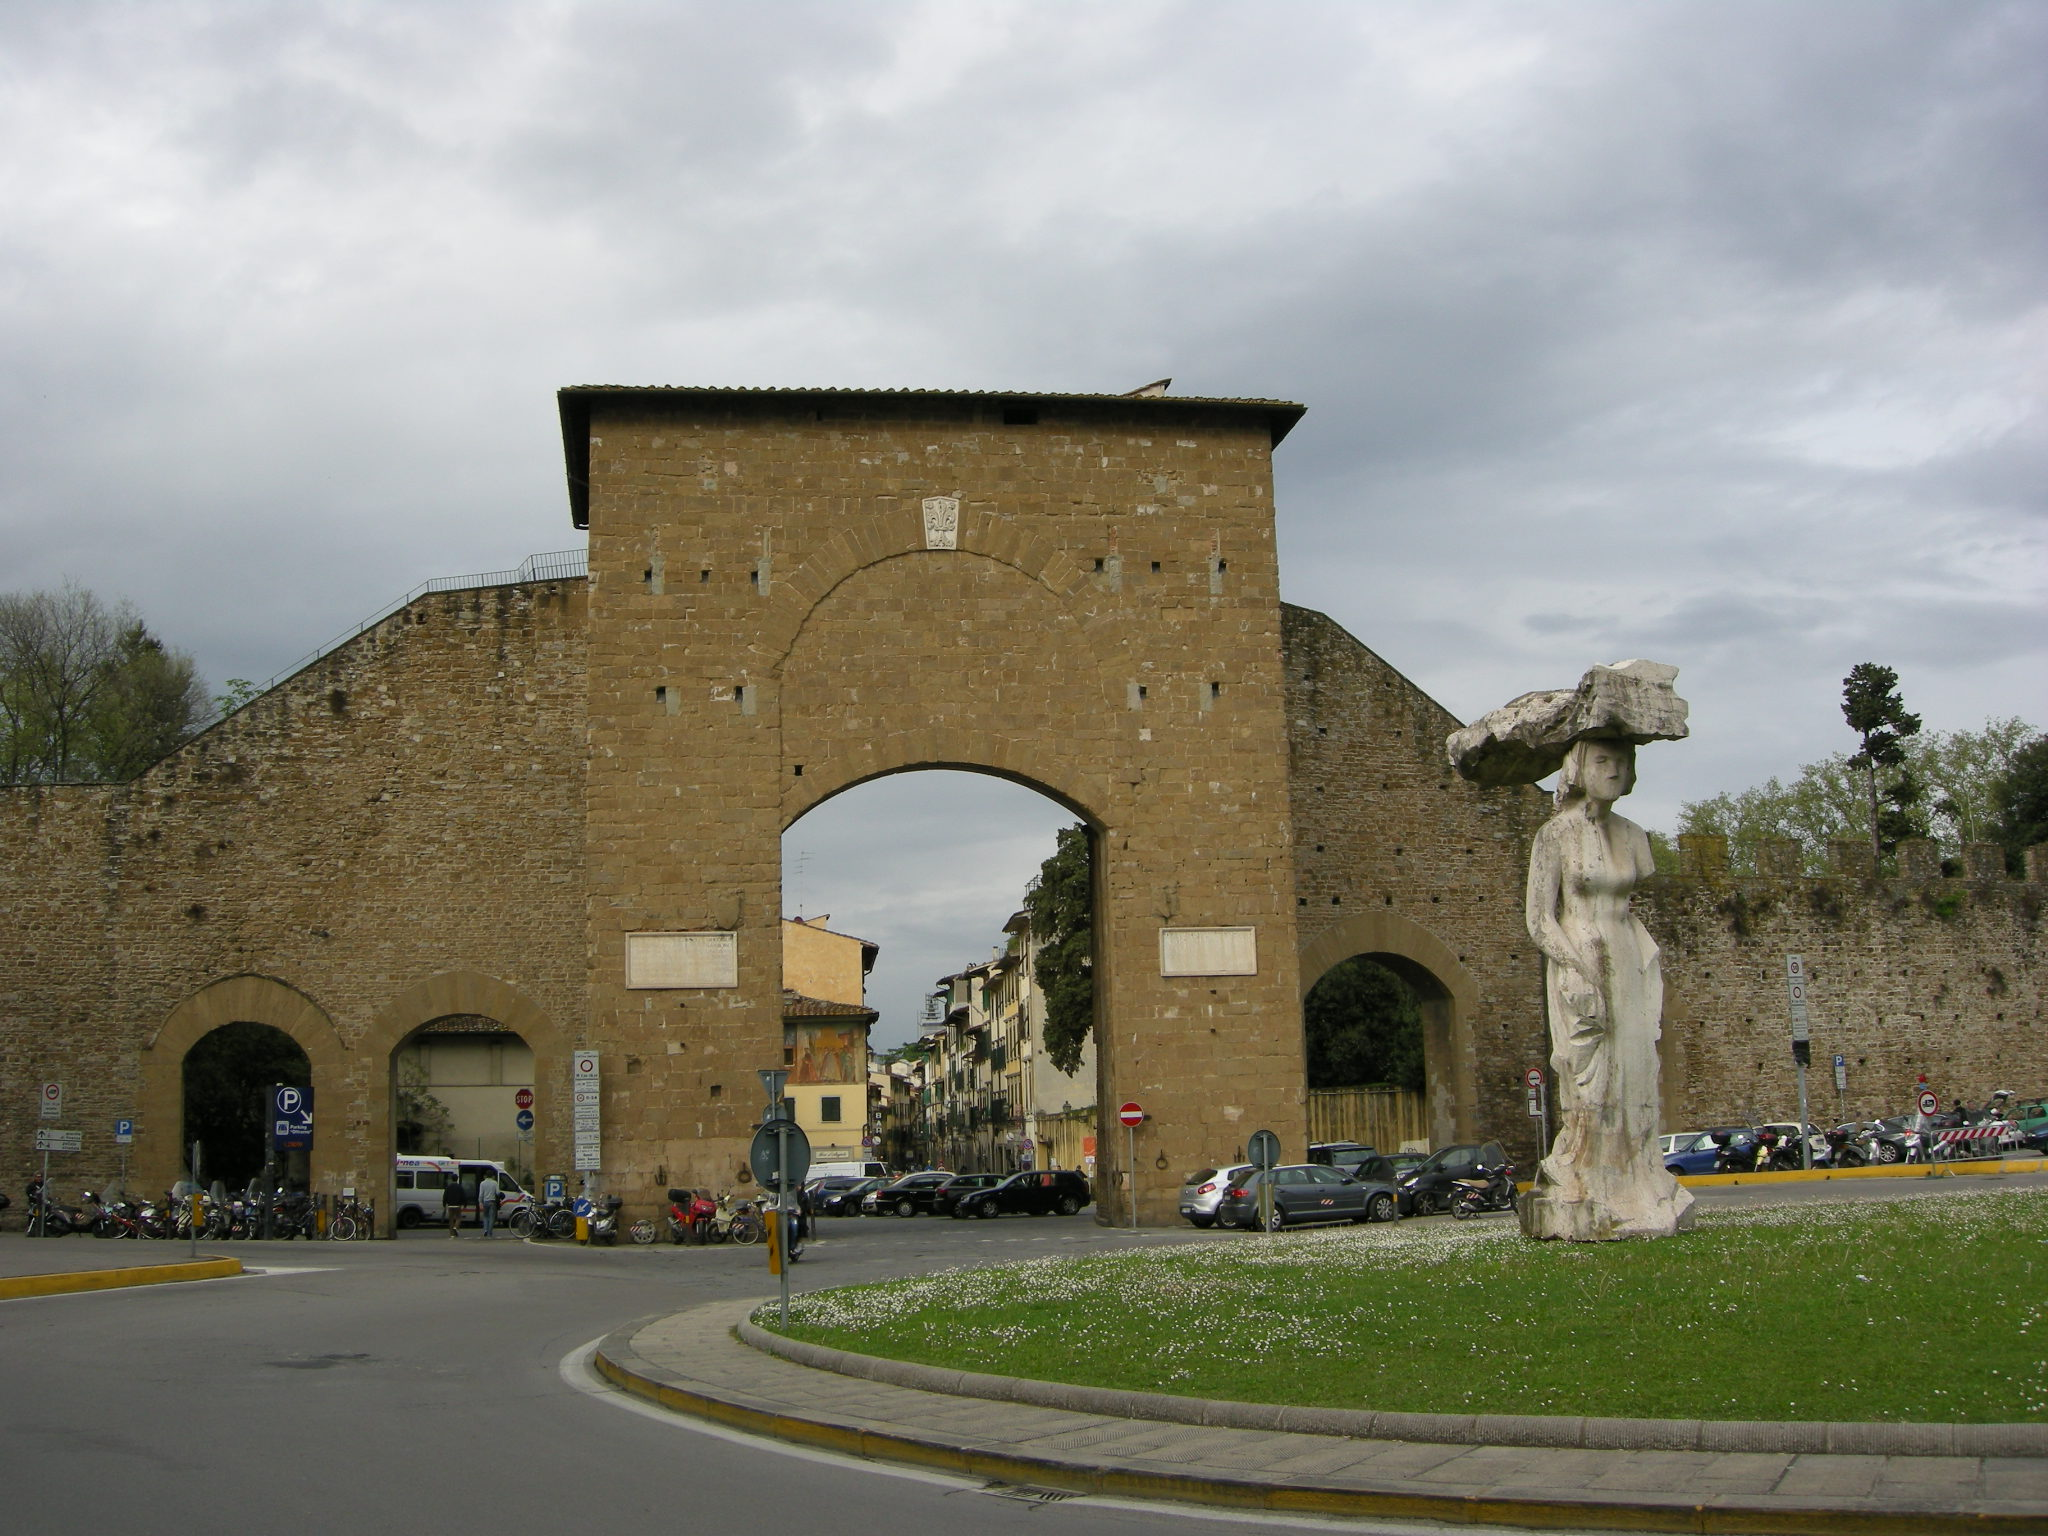 Porta_romana,_firenze,_esterno.JPG